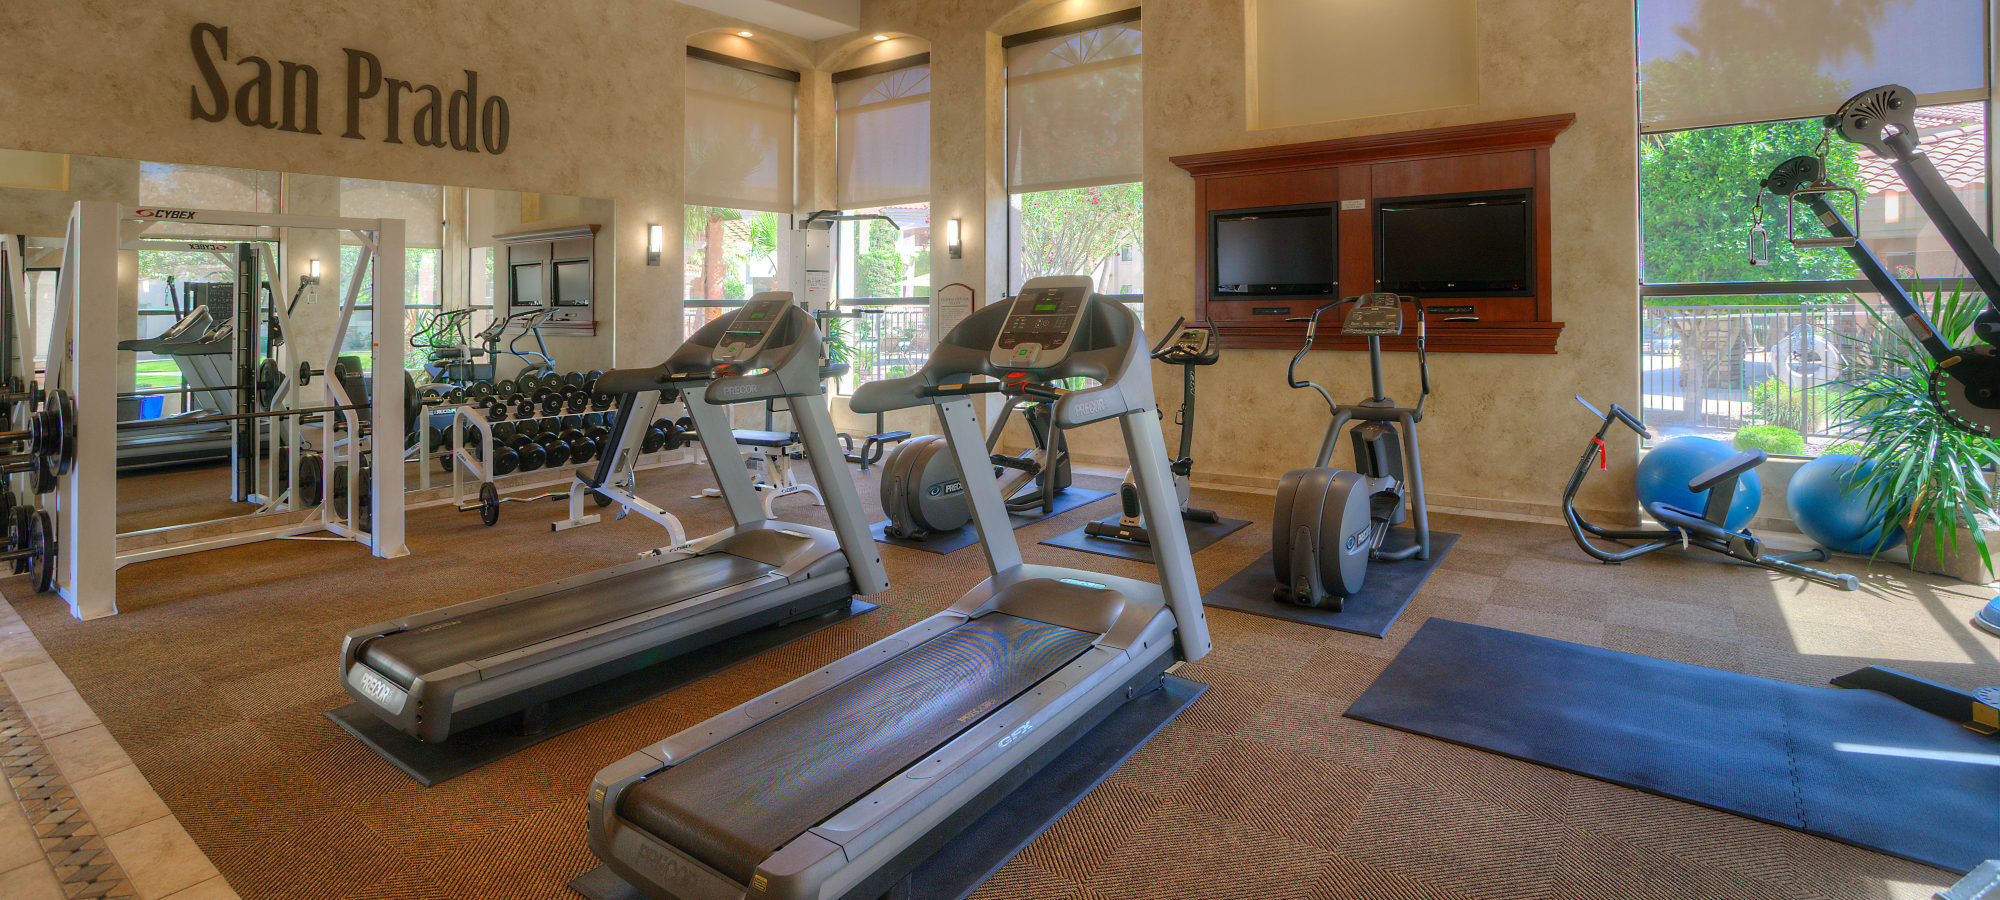 Modern fitness center featuring treadmills at San Prado in Glendale, Arizona